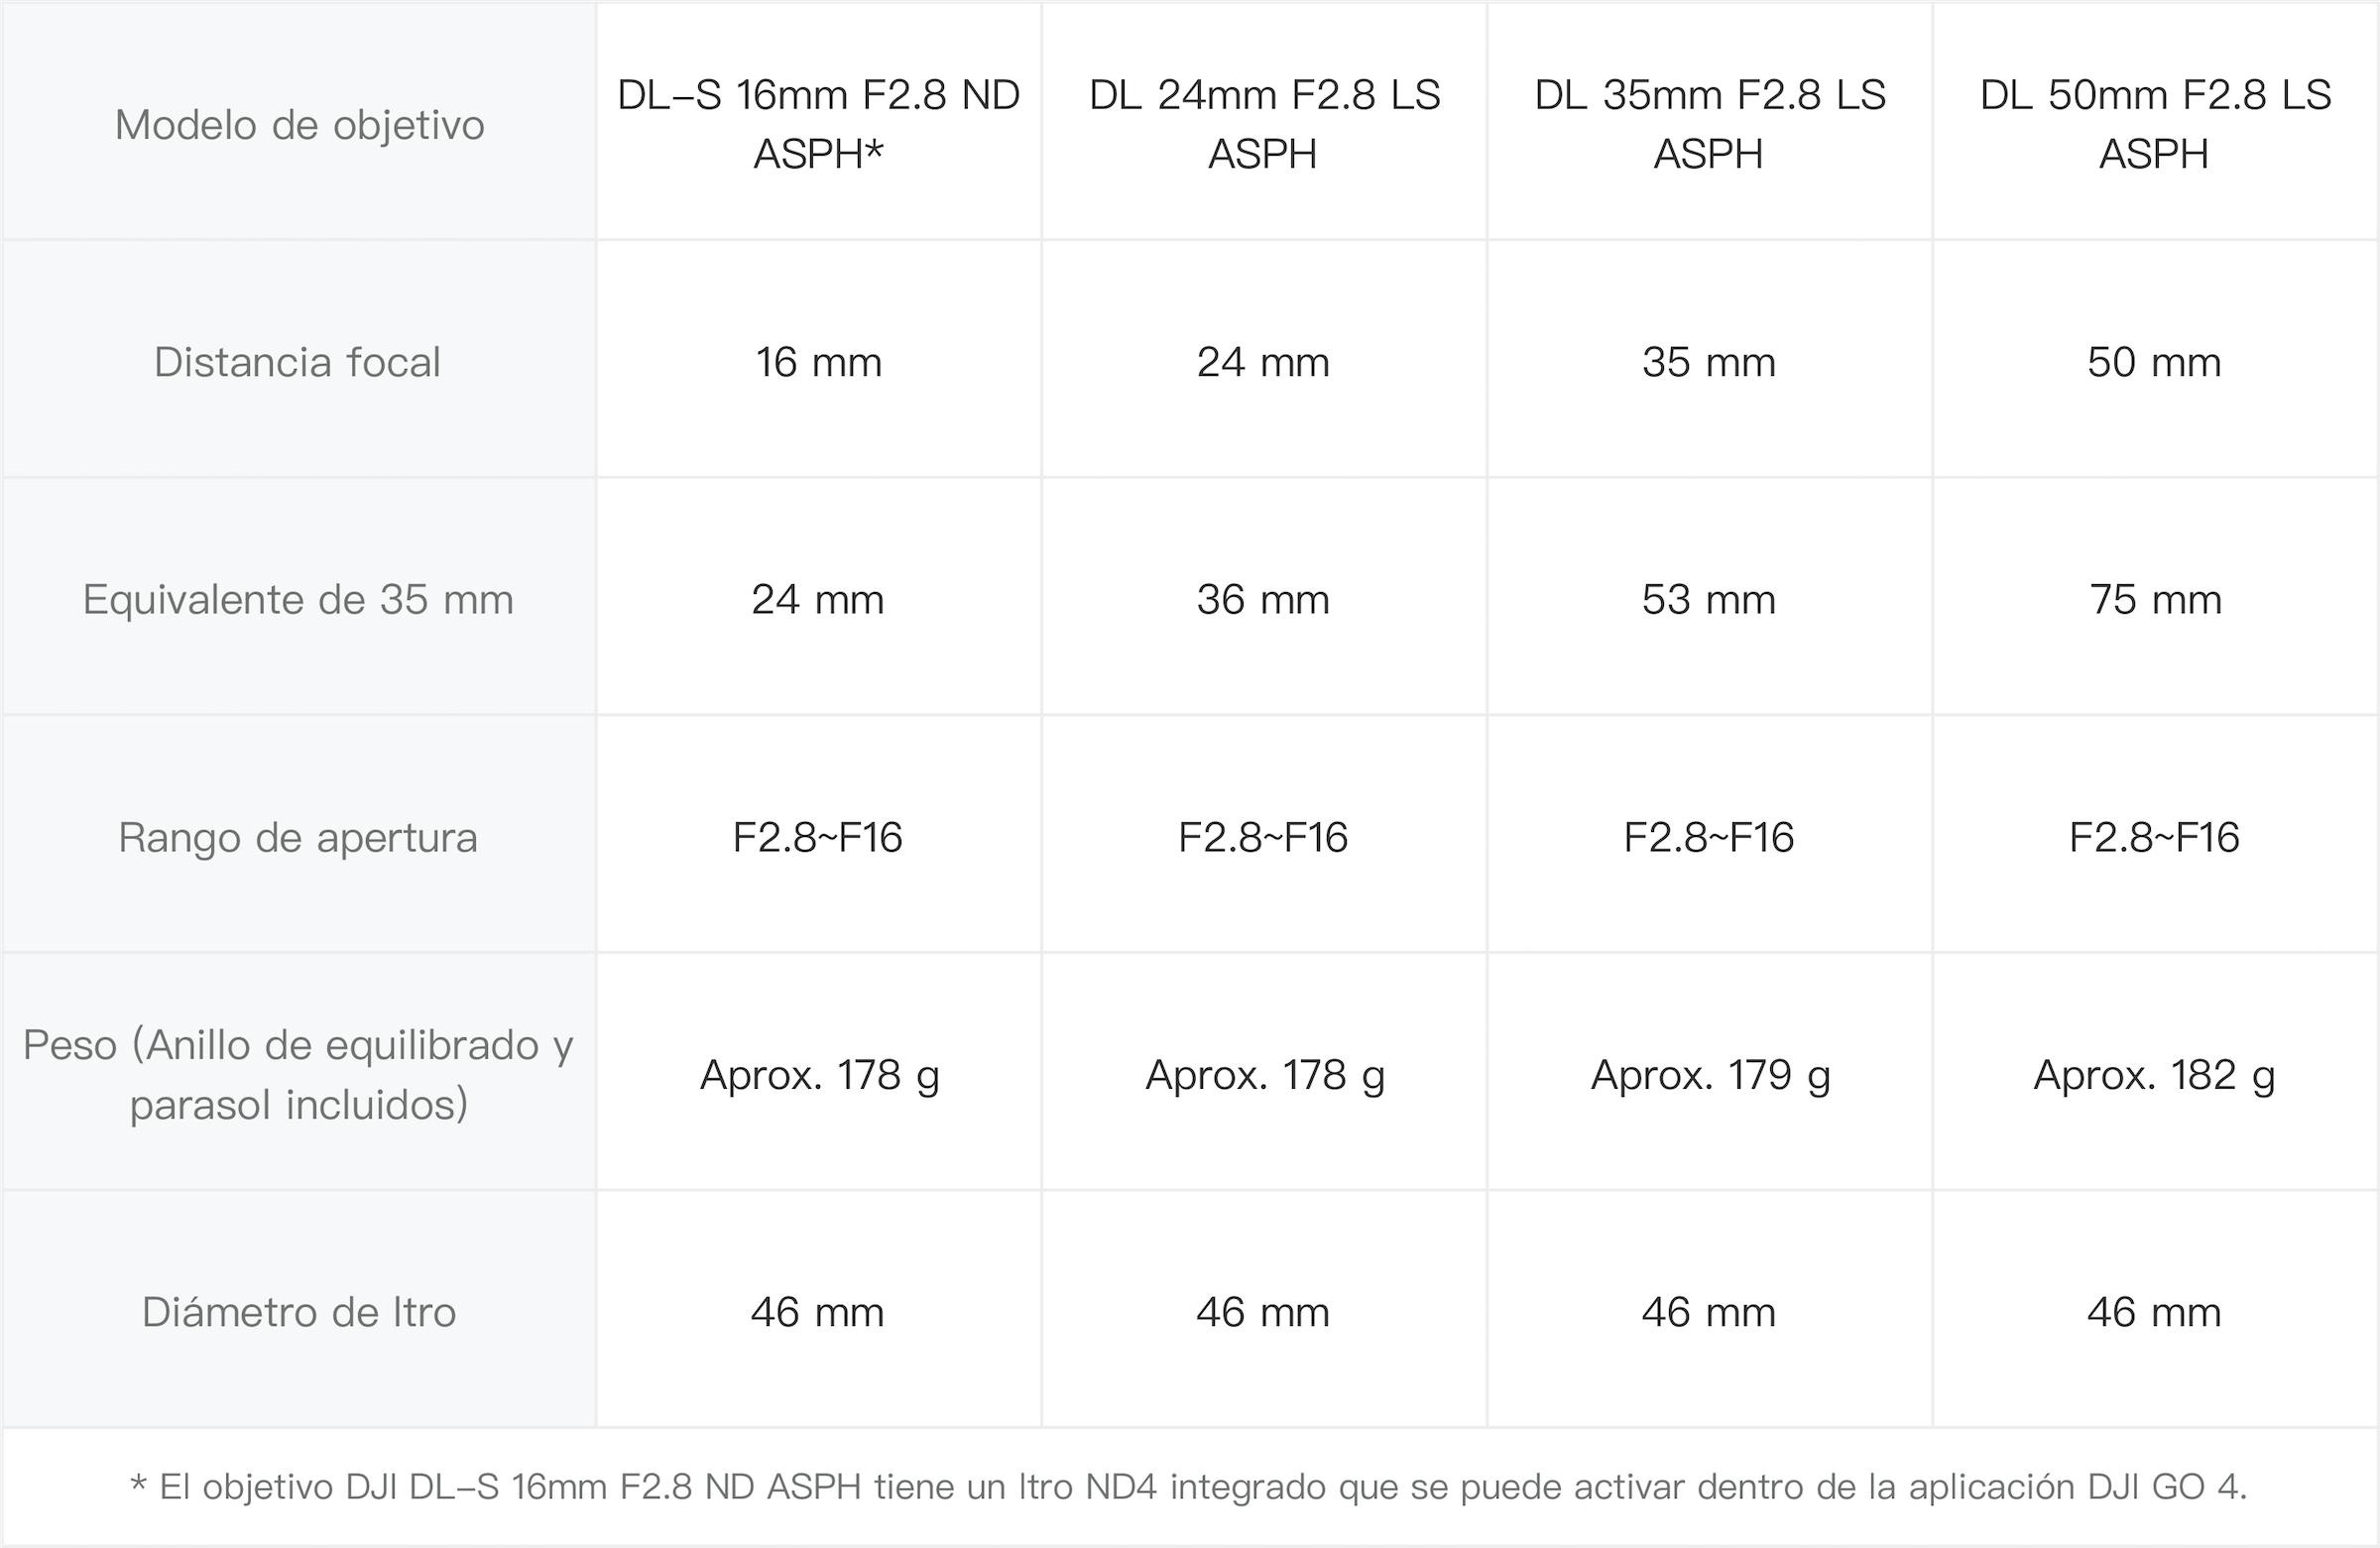 Objetivo DL-S 16mm F2.8 ND ASPH para la Zenmuse X7